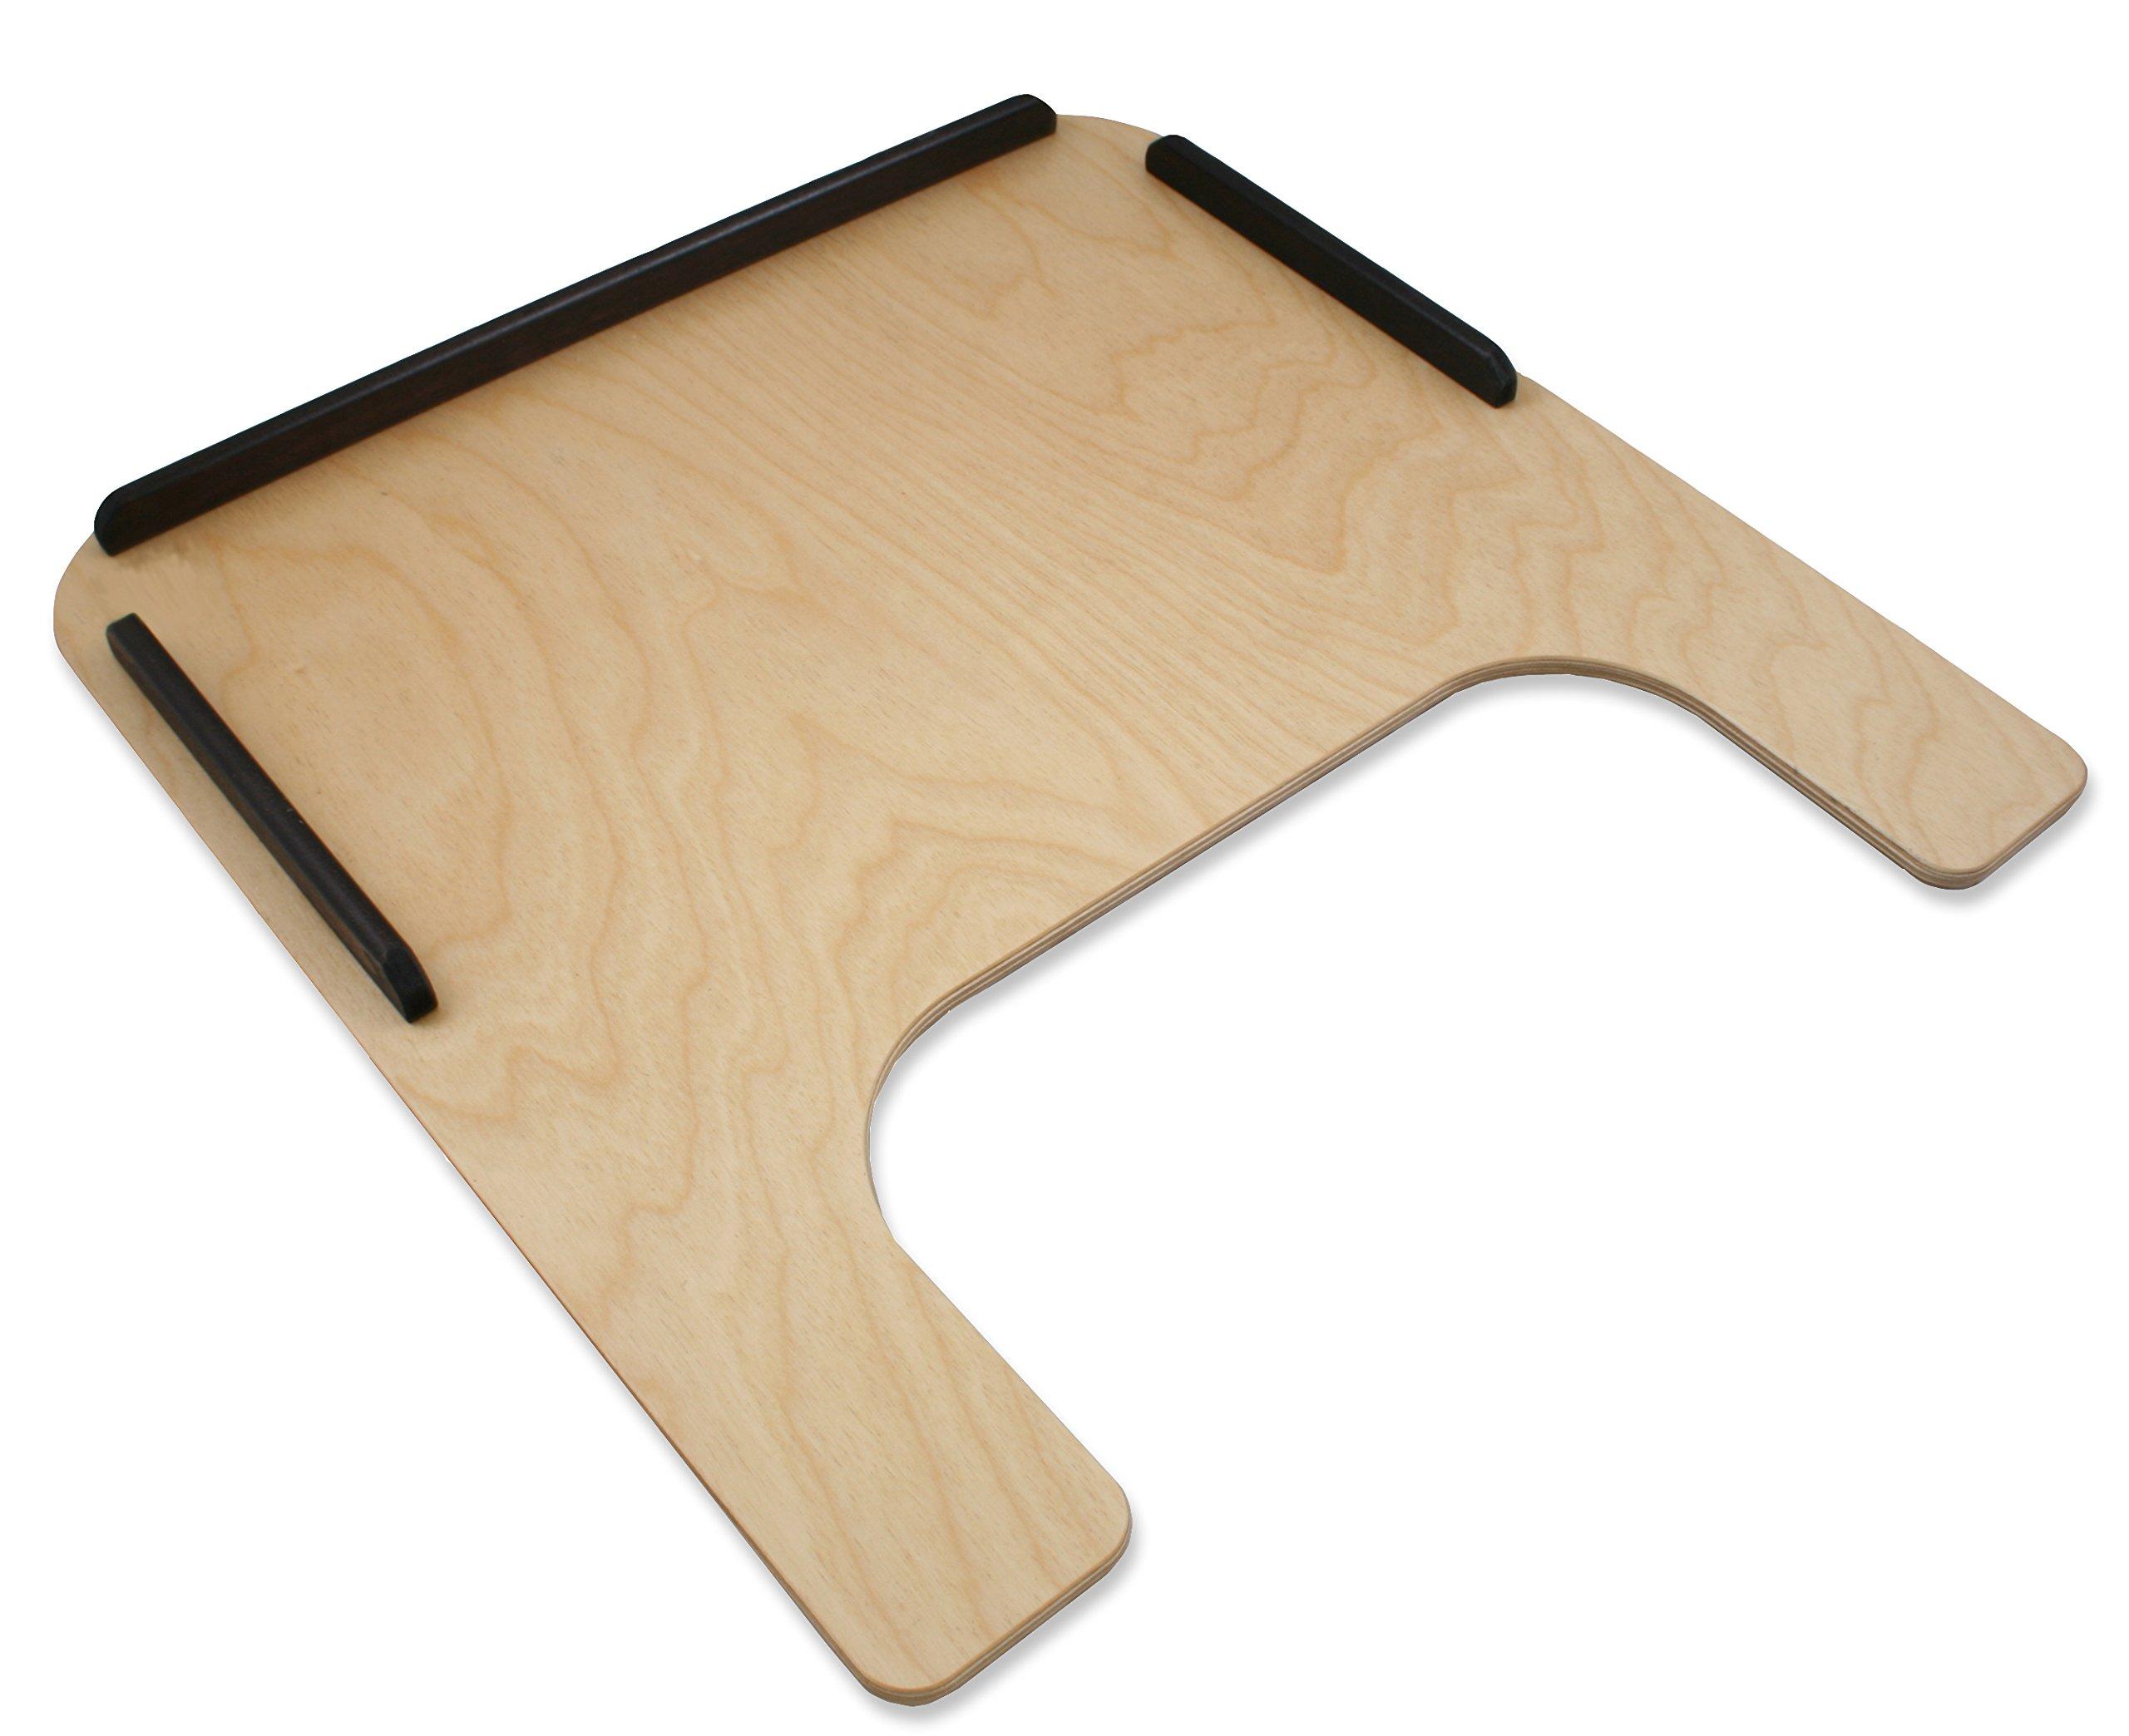 Rehabilitation Advantage Birch Plywood Wheelchair Tray with Wood Rim with Velcro Straps, Junior, 2.95 Pound